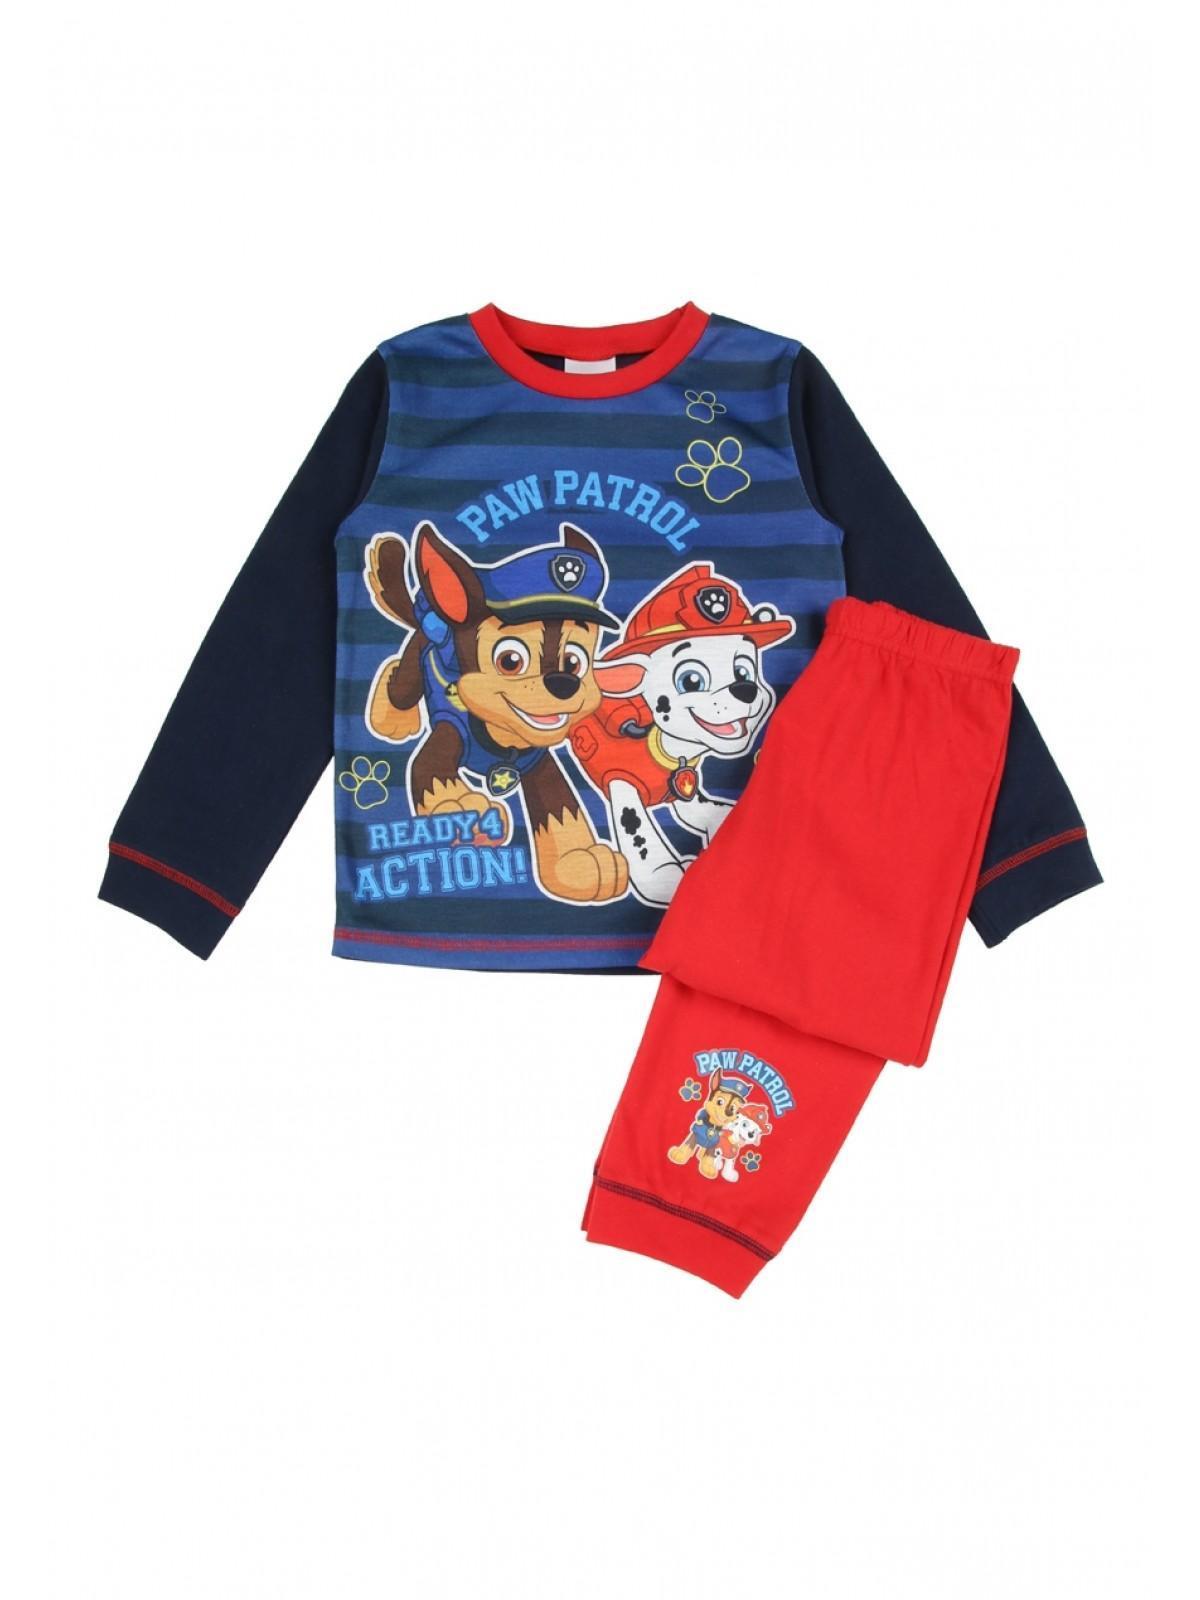 96973c4ad Home; Younger Boys Paw Patrol Pyjamas. Back. PreviousNext